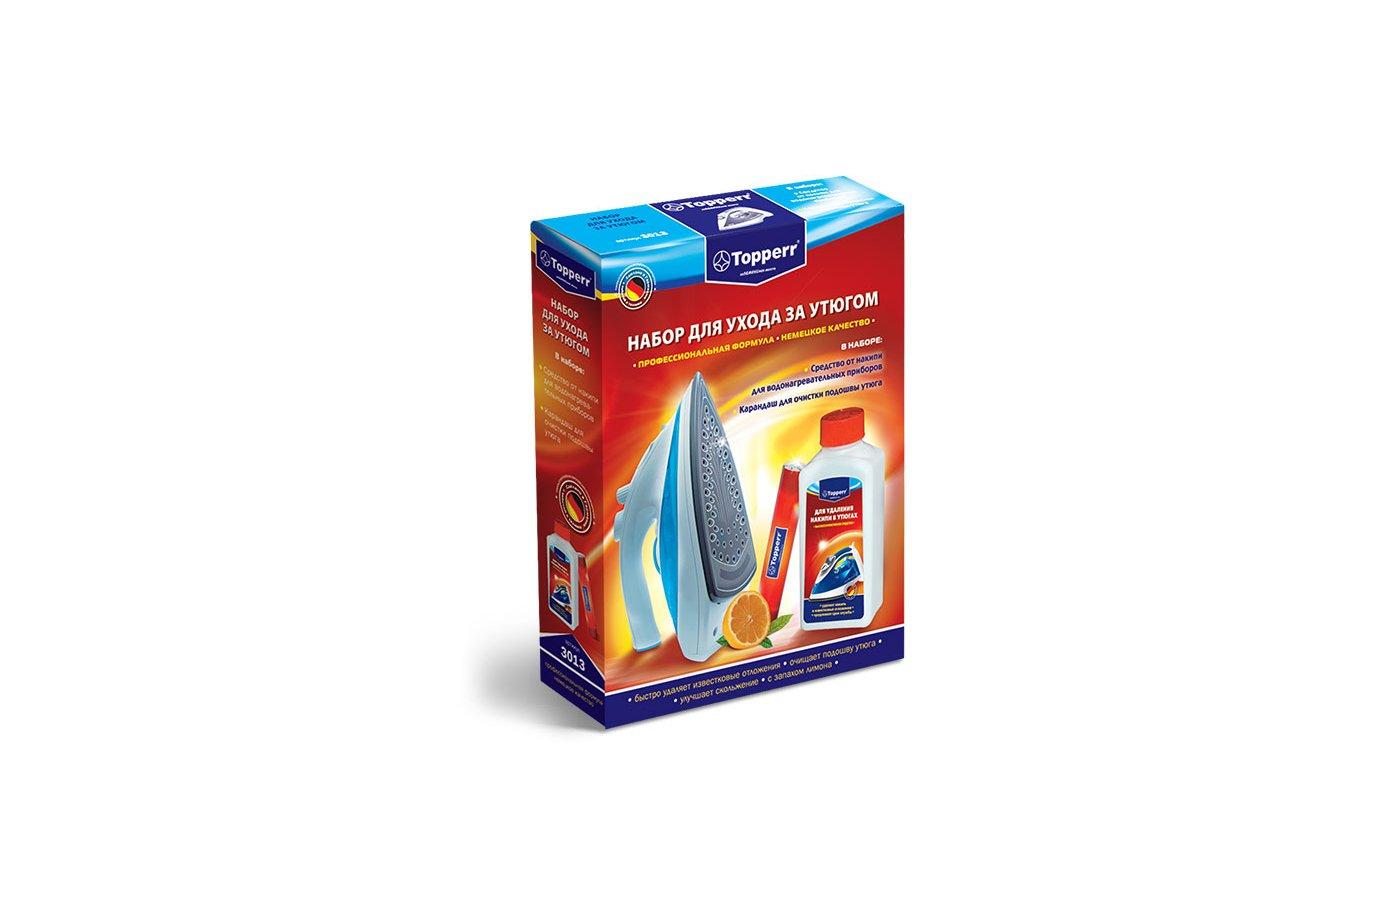 Аксессуары для утюгов TOPPERR 3013 Набор для утюга 2 предмета